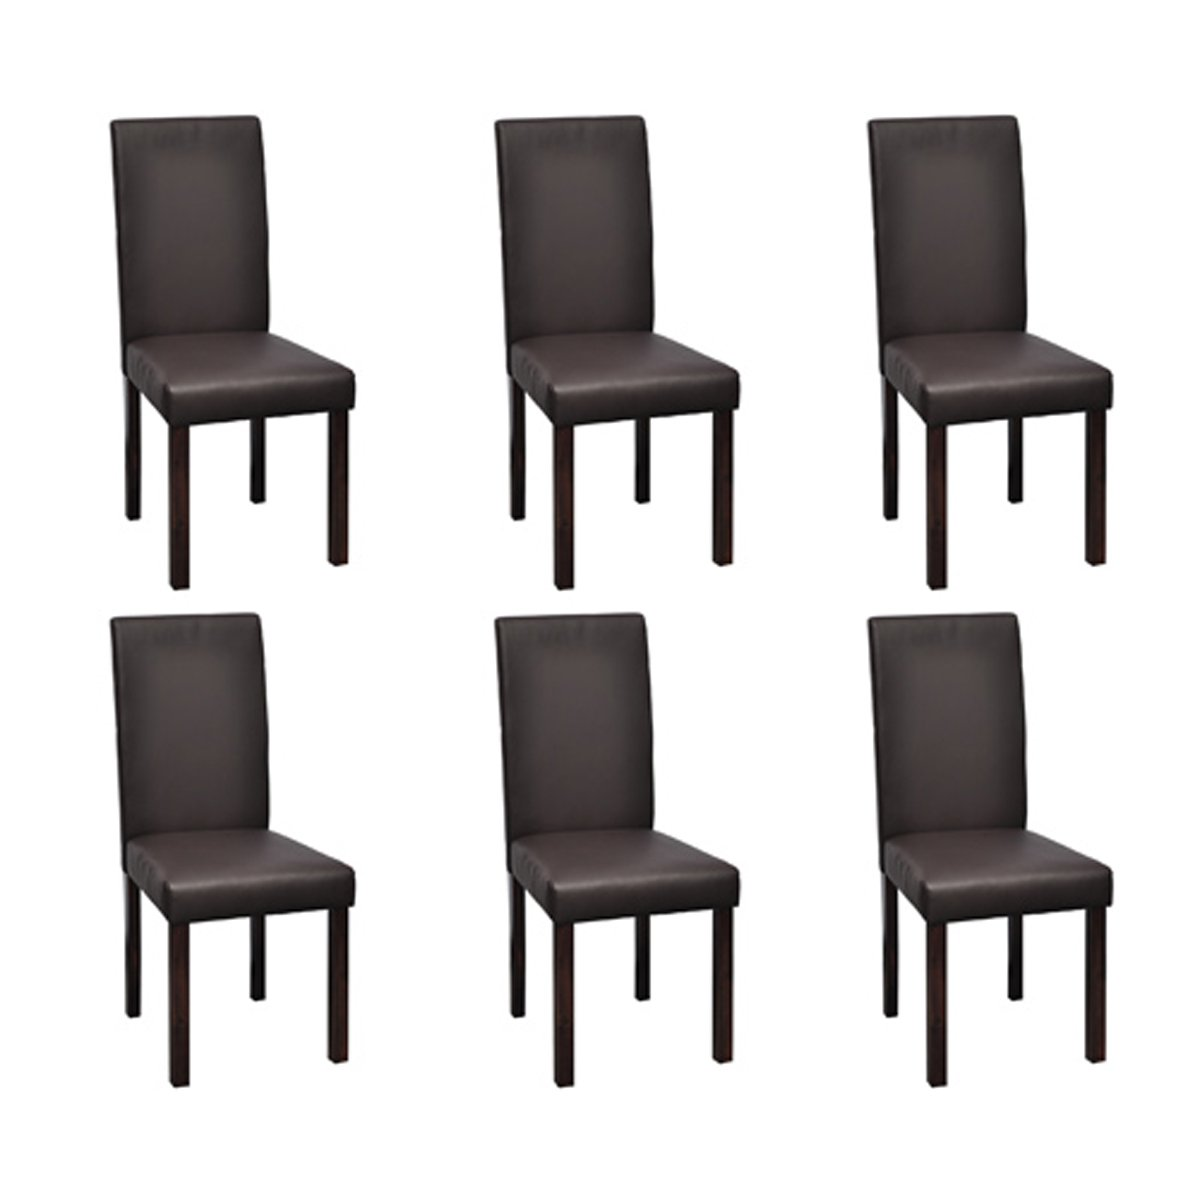 6 Stühle Stuhlgruppe Hochlehner Esszimmerstühle